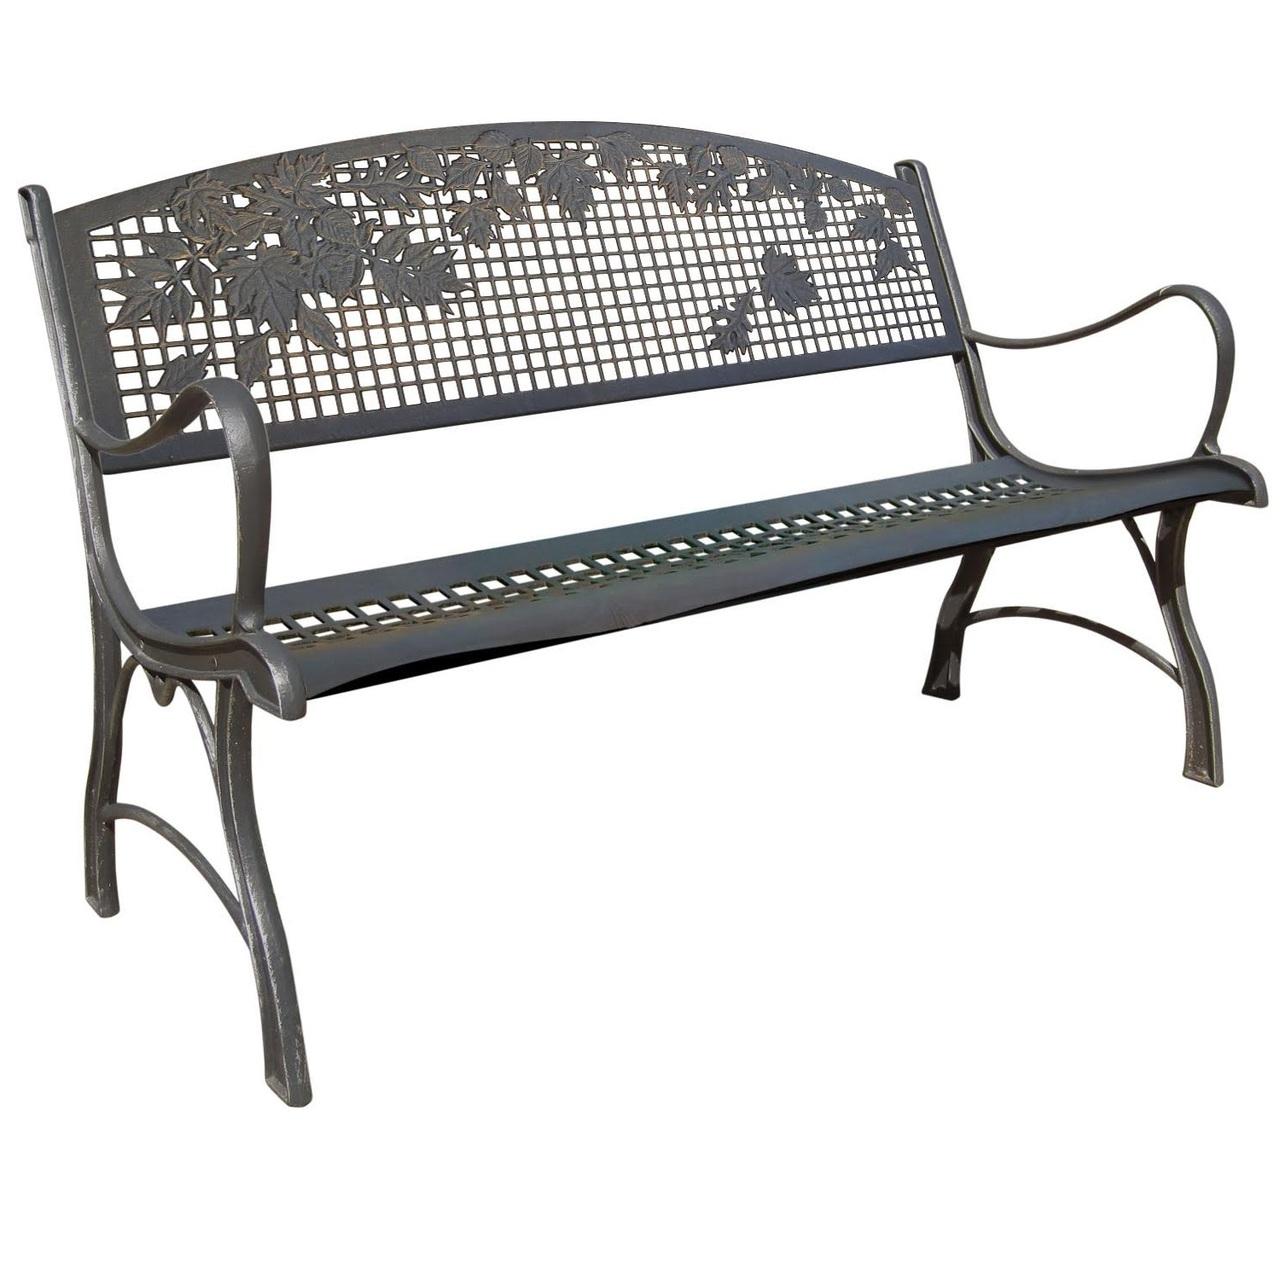 Sensational Leaf Cast Iron Garden Bench Dailytribune Chair Design For Home Dailytribuneorg